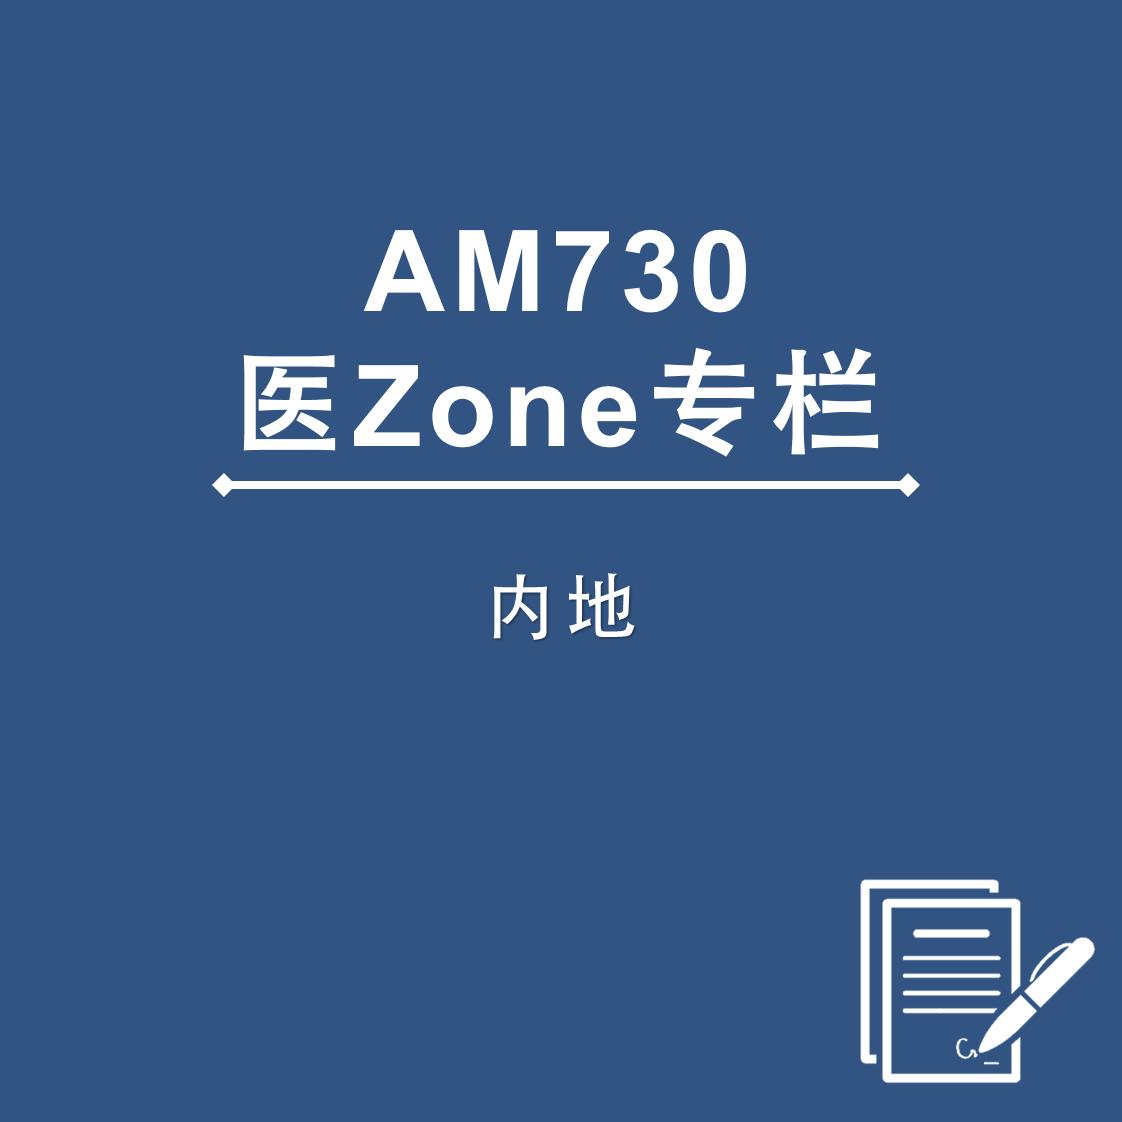 AM730 医Zone 专栏 - 内地